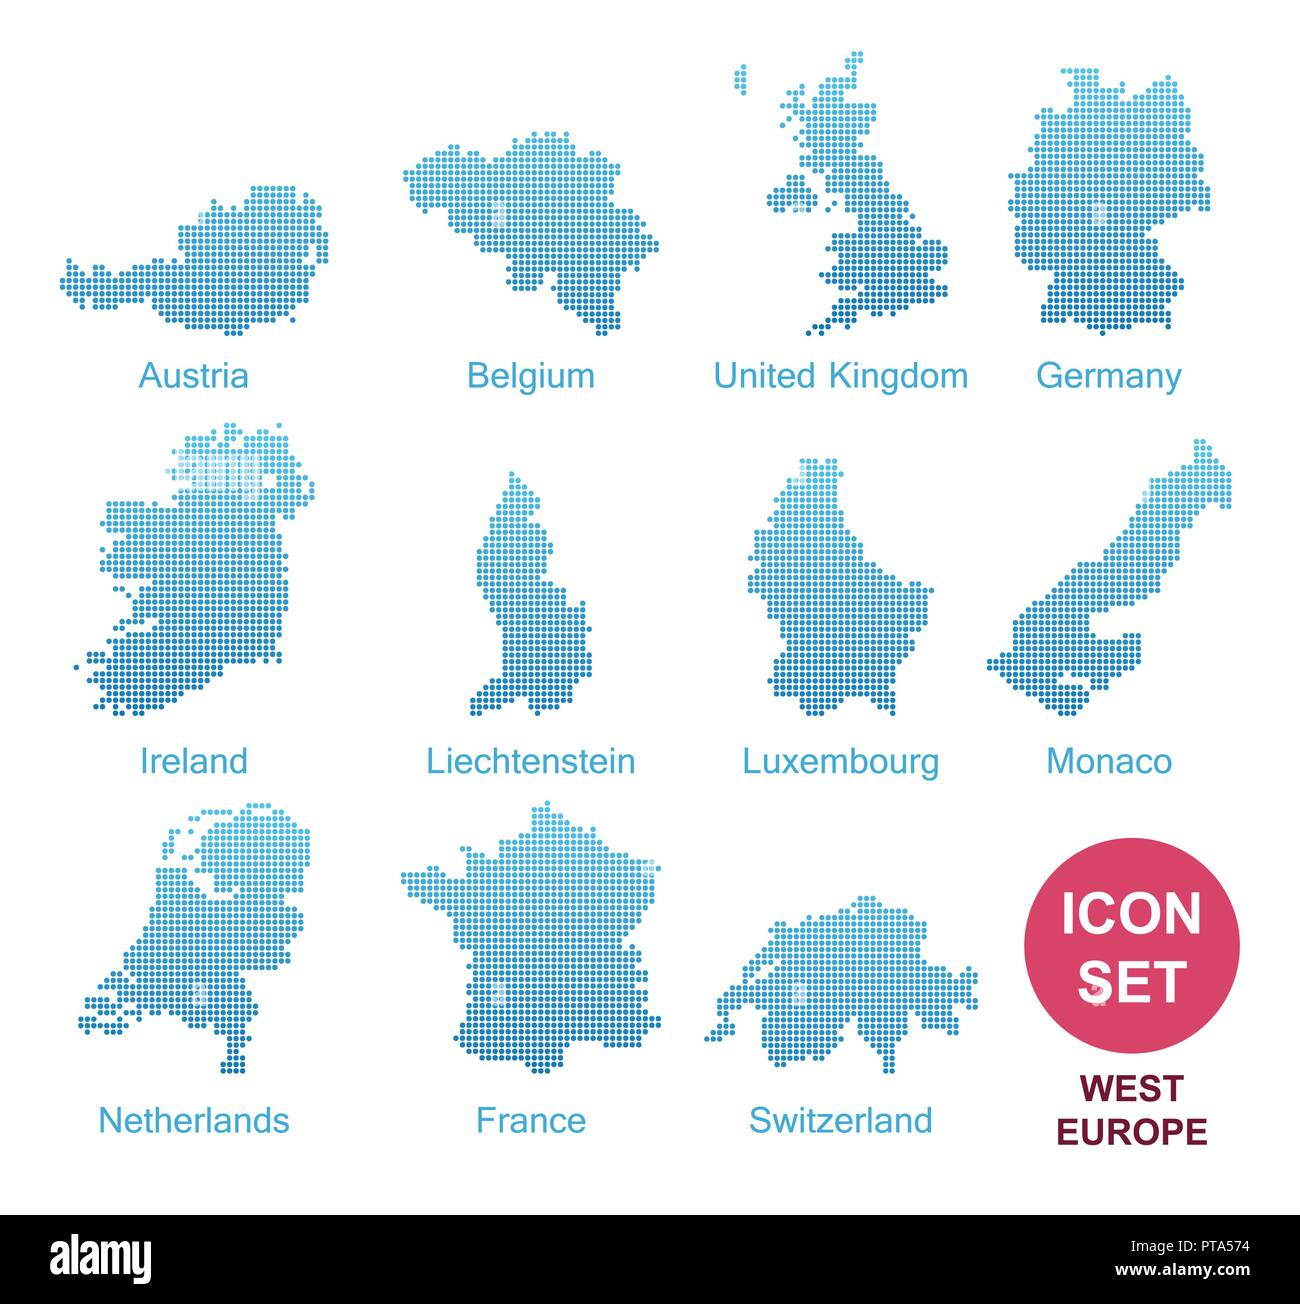 Counties of West Europe - Stock Vector